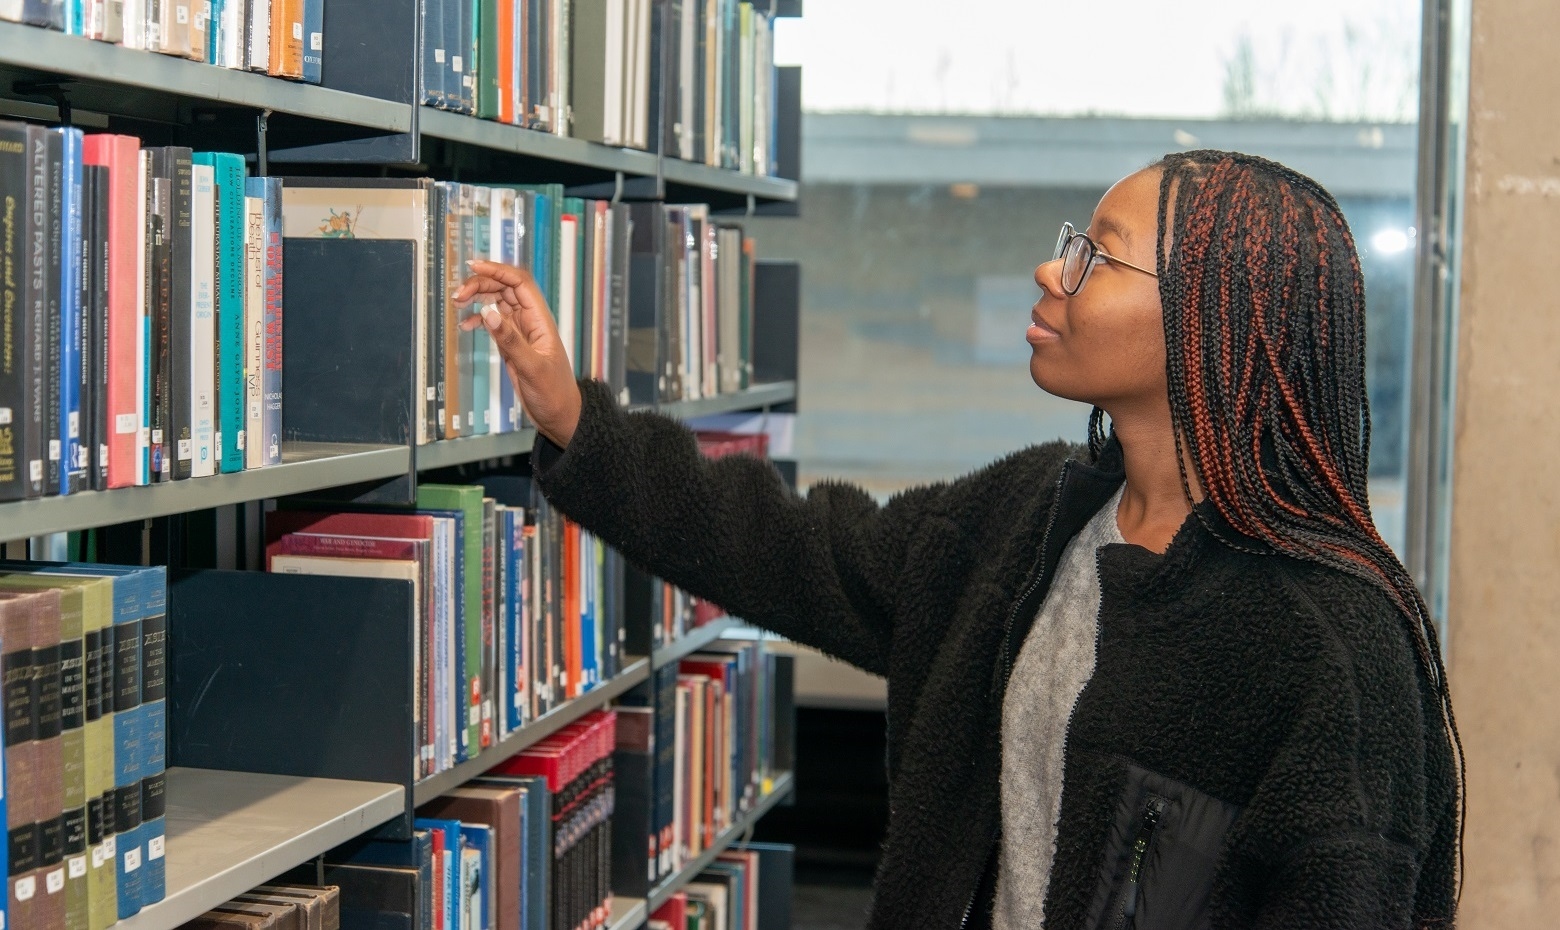 Literature searching - advanced skills